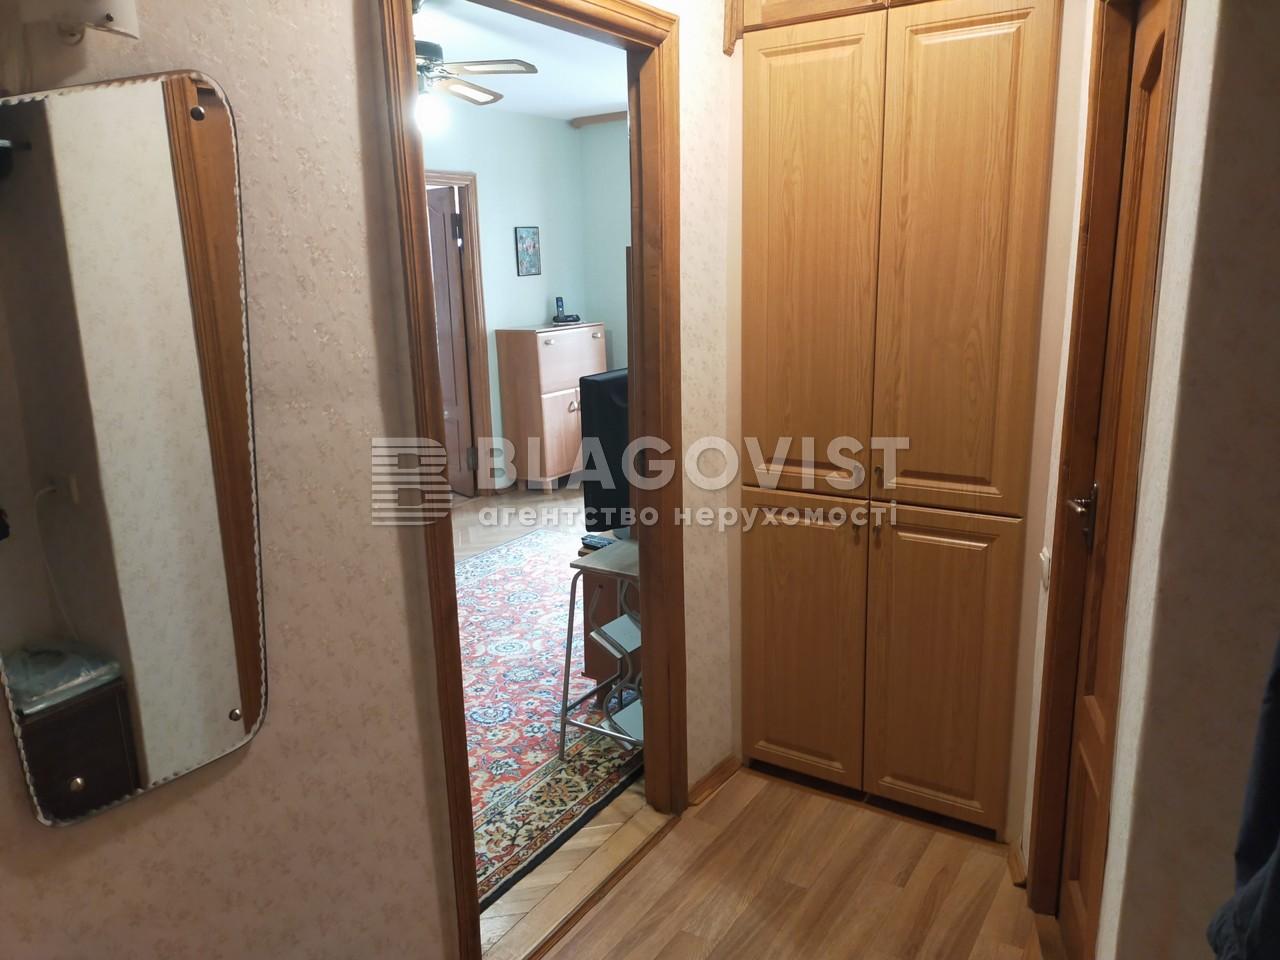 Квартира M-39350, Неманская, 6, Киев - Фото 10